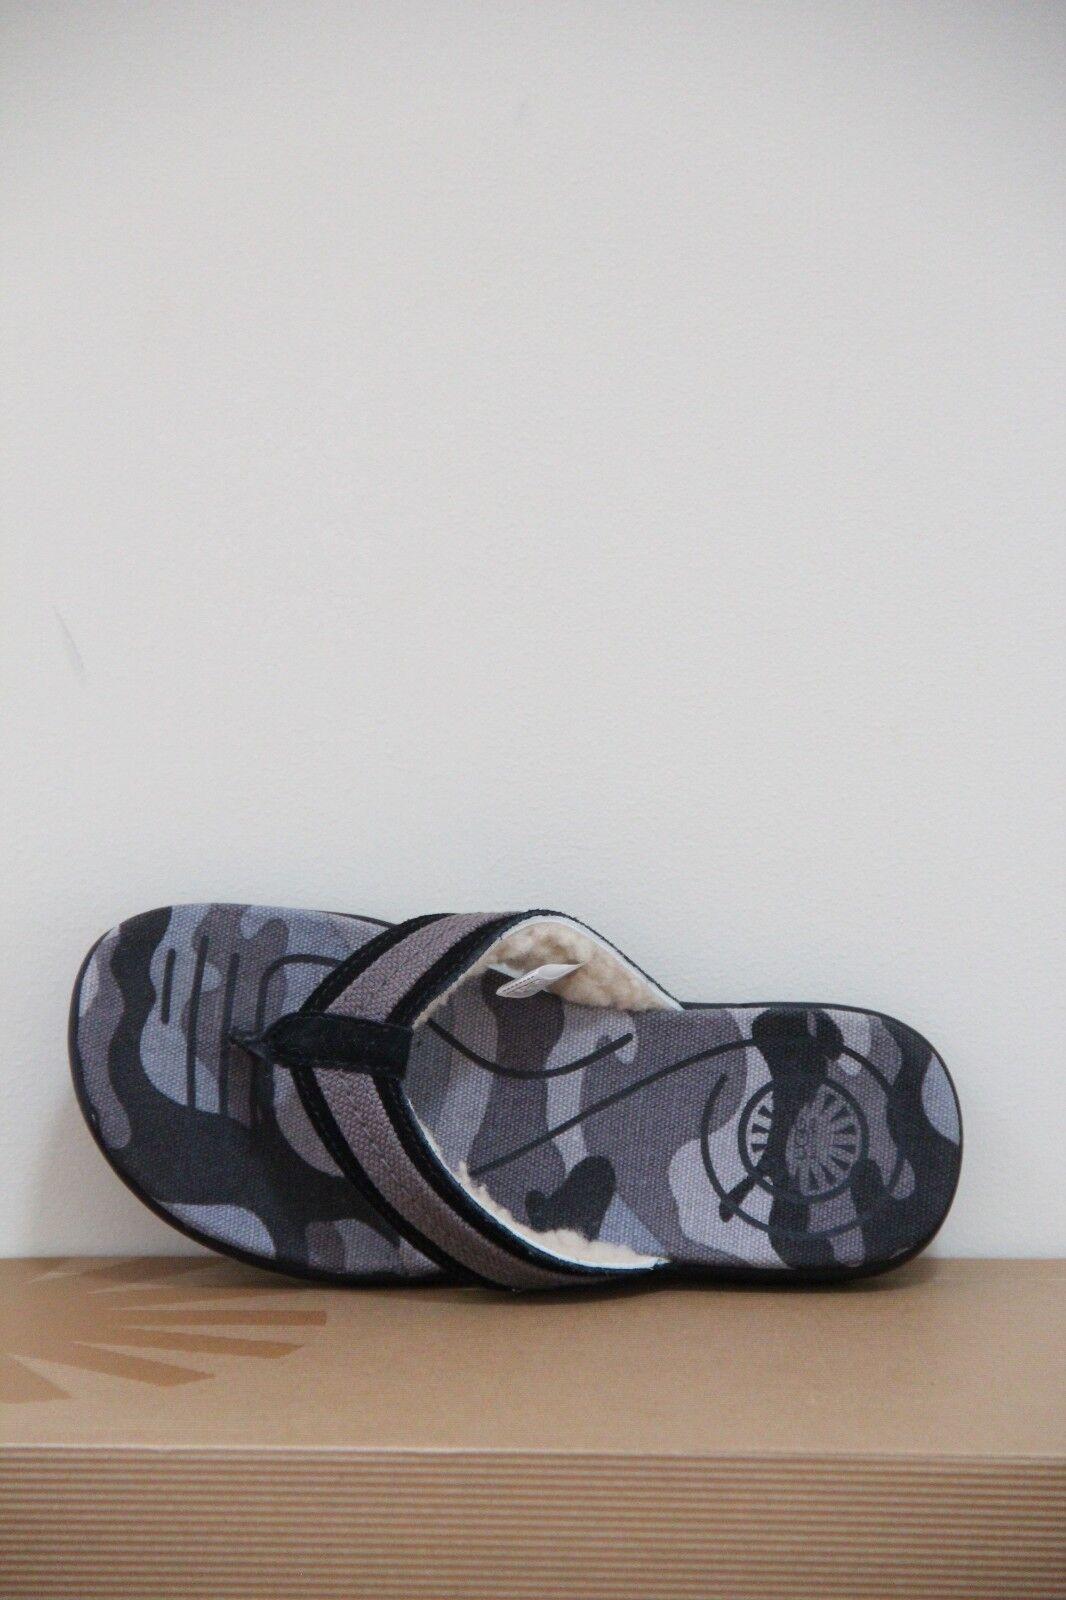 Ugg Australia Enfants Sandales Nike Taille 2 NIB